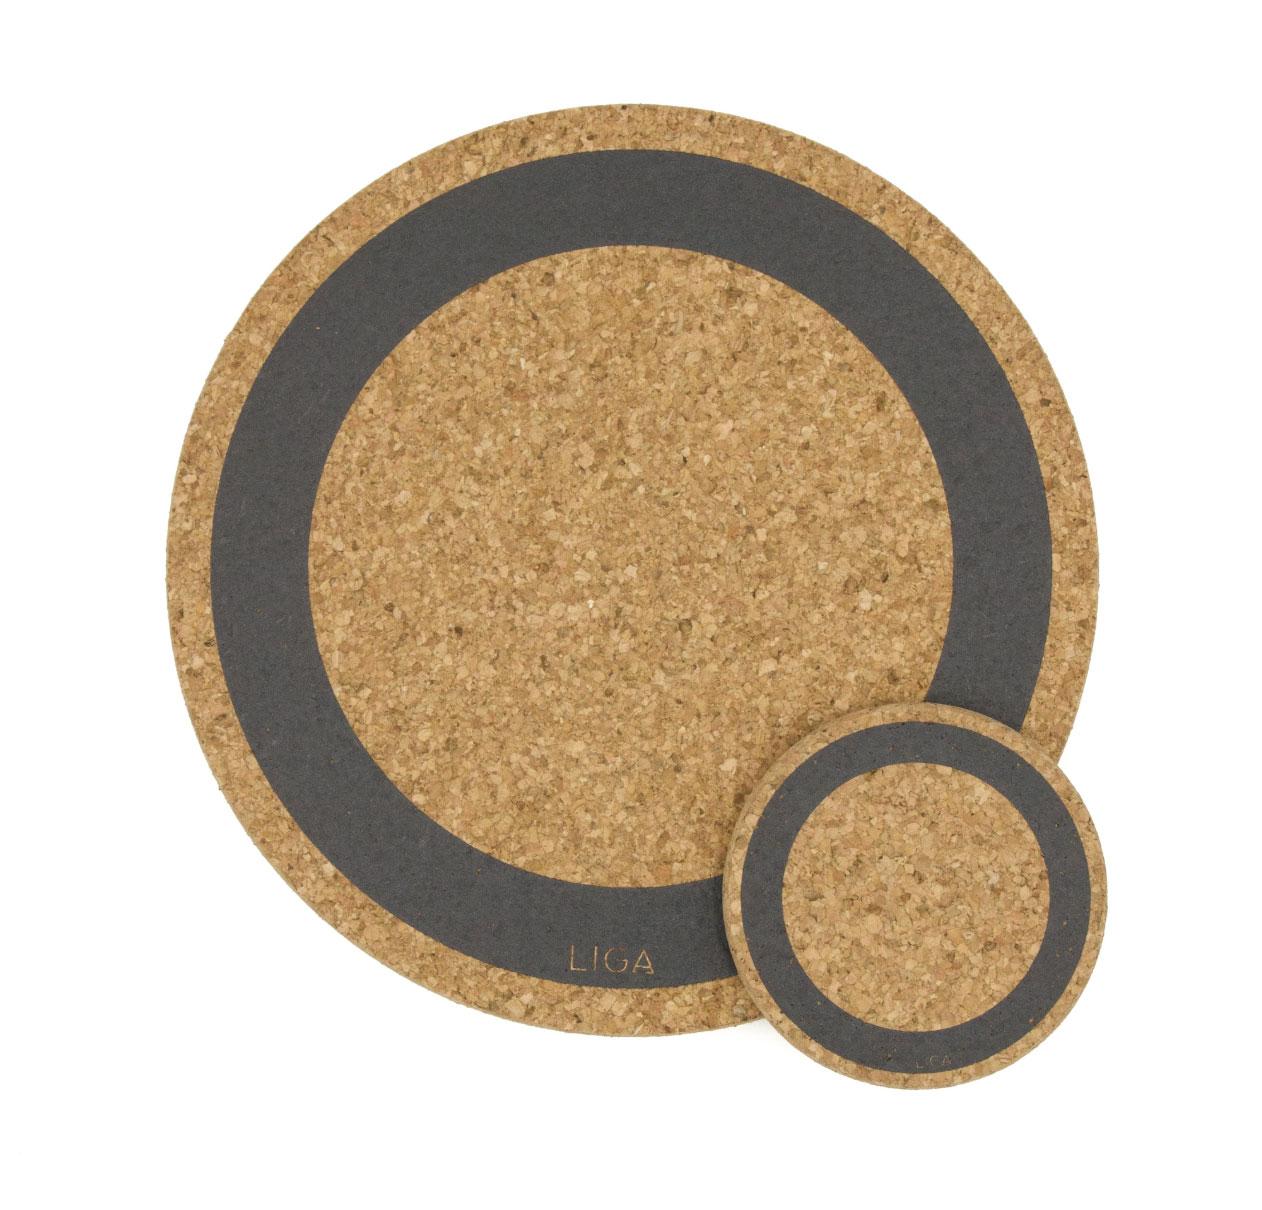 Liga Earth Cork Placemats